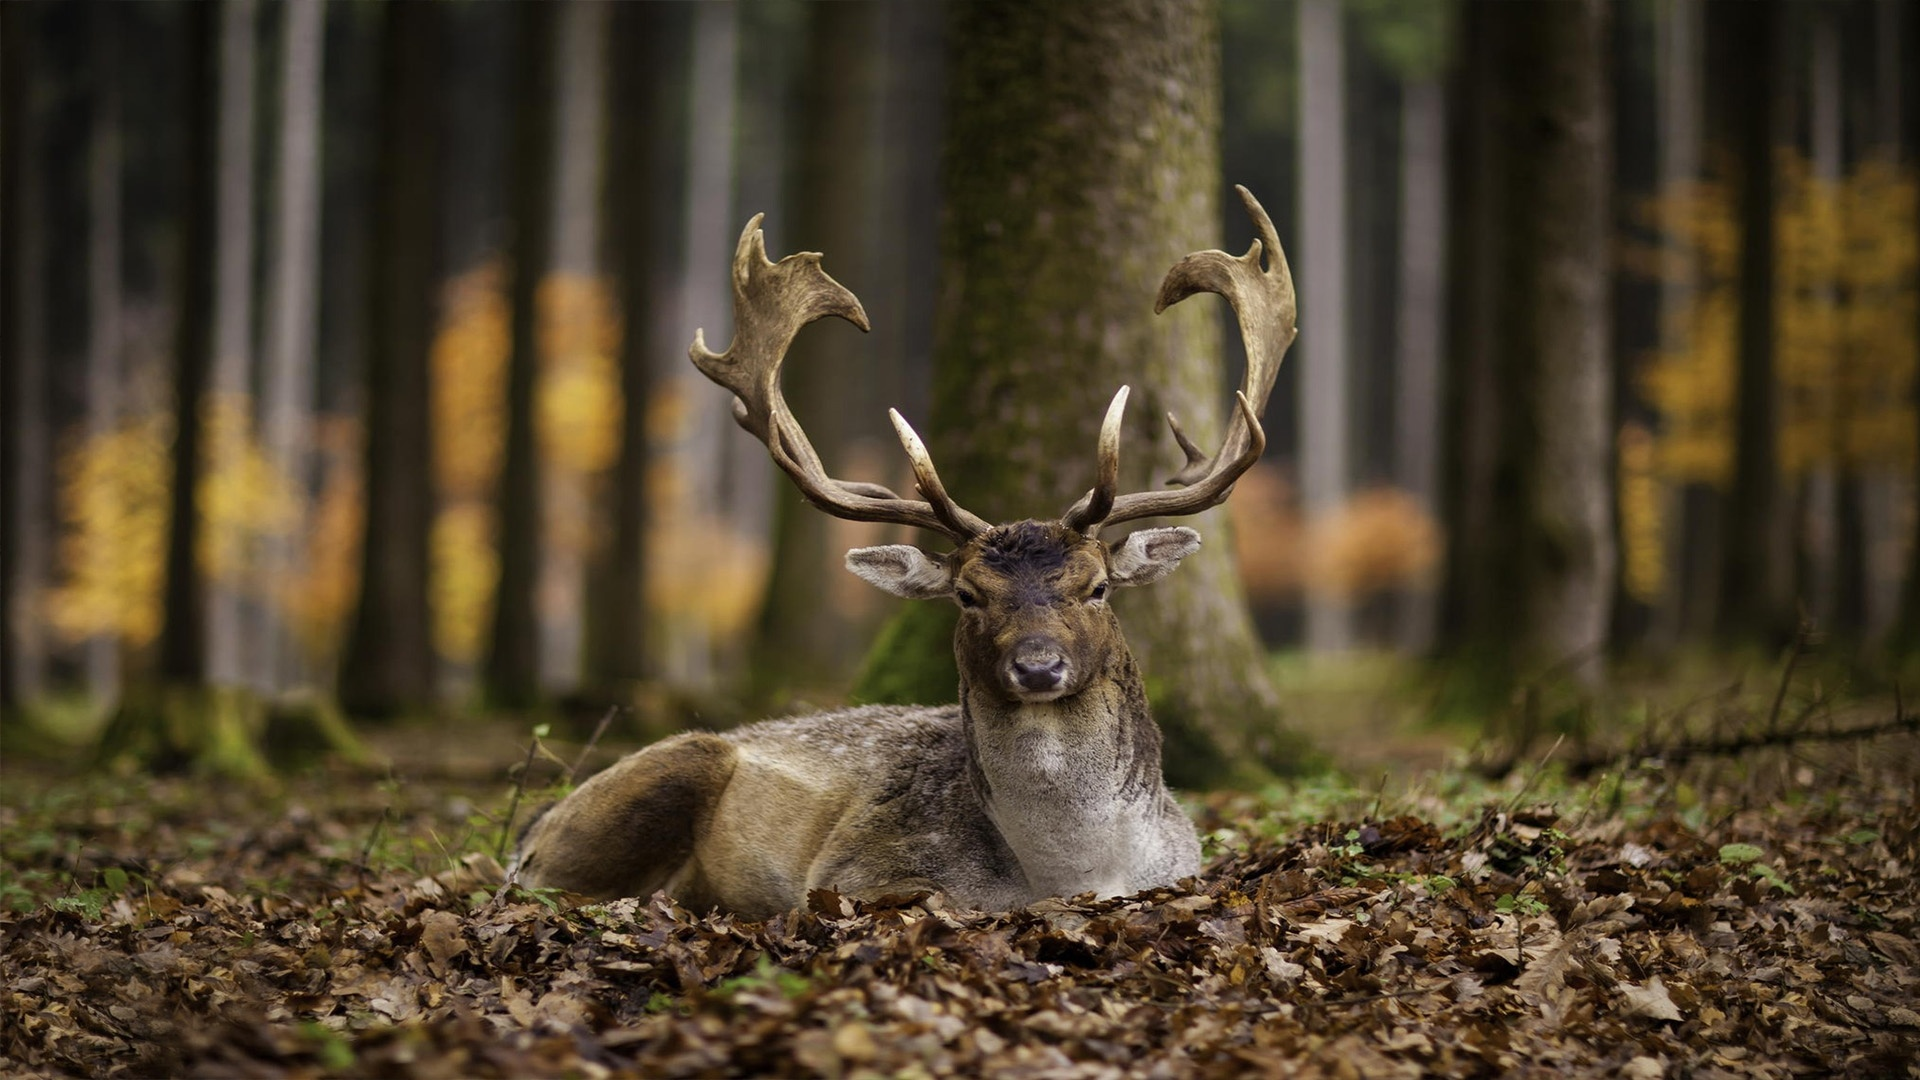 Deer In The Forest HD Wallpaper